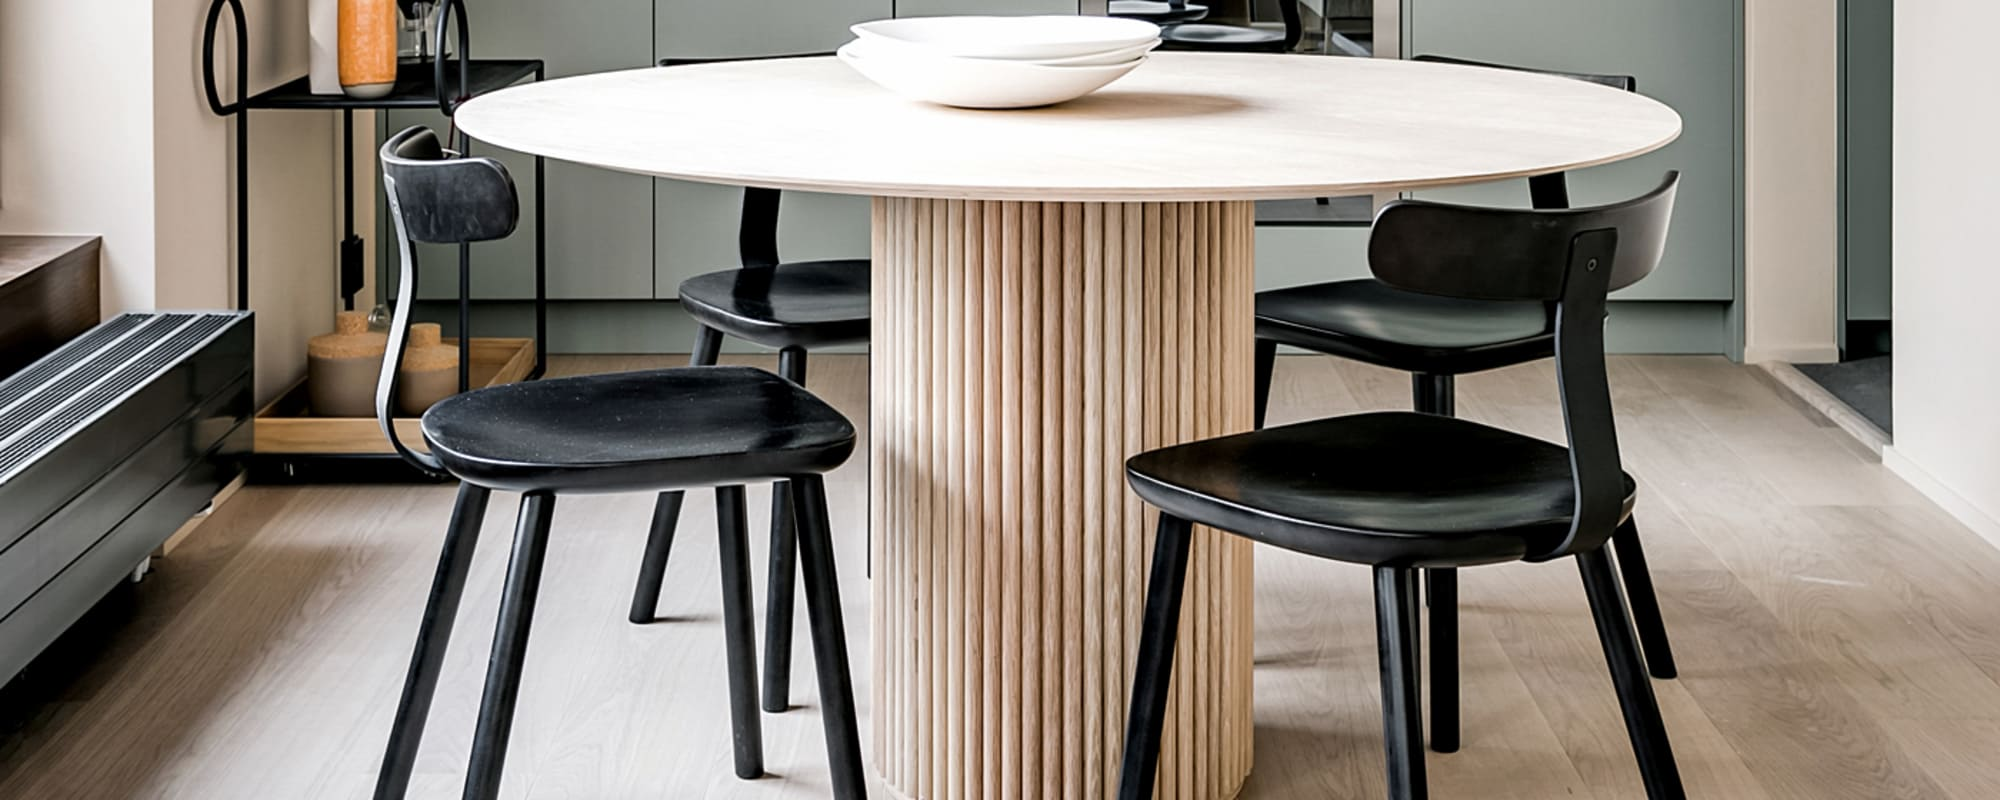 Note Design Studio, Küche, Stockholm